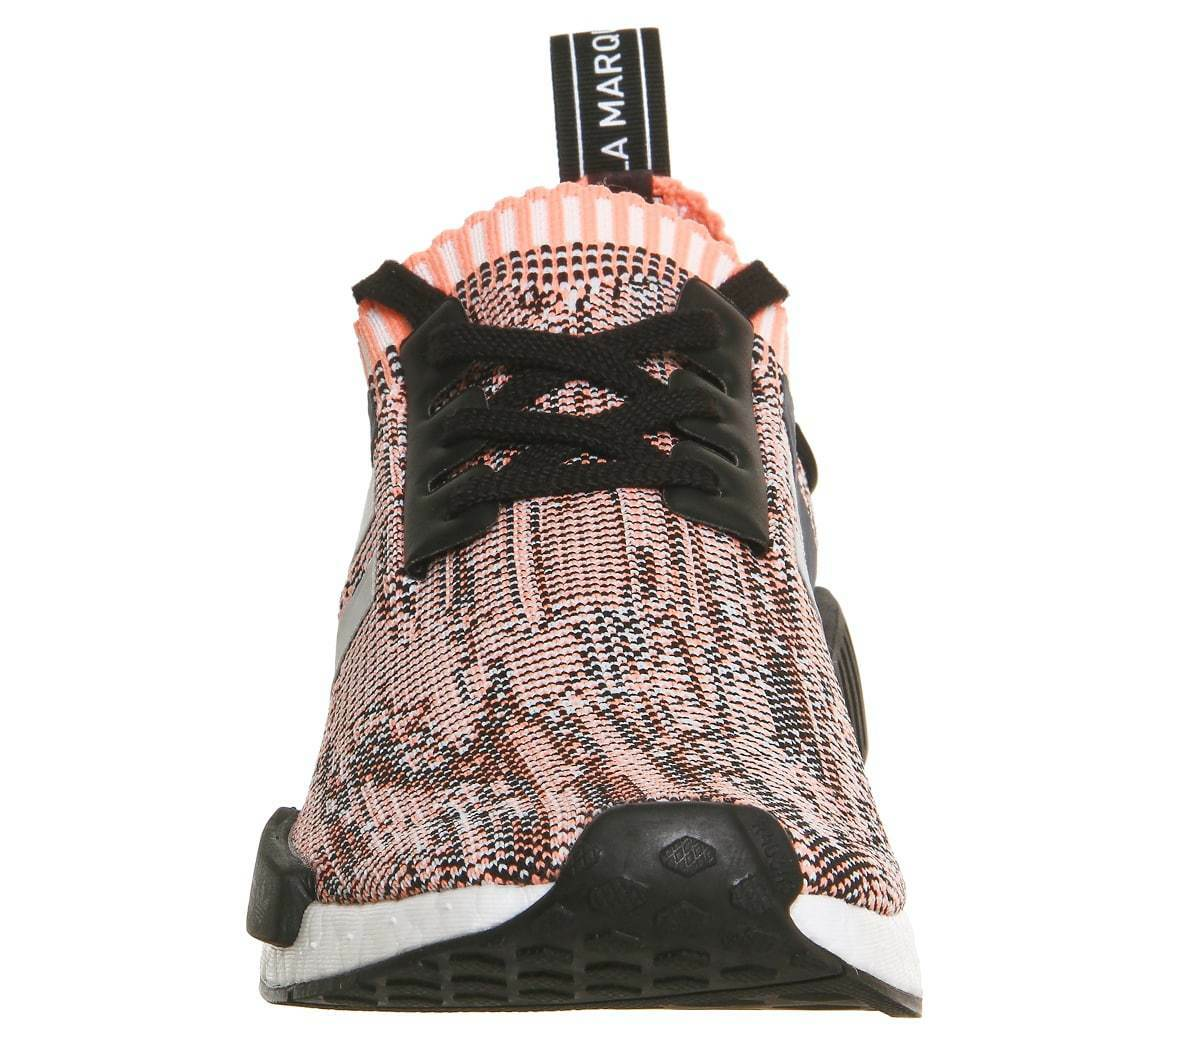 Adidas donne nmd r1 formatori primeknit formatori r1 dimensioni c5256a